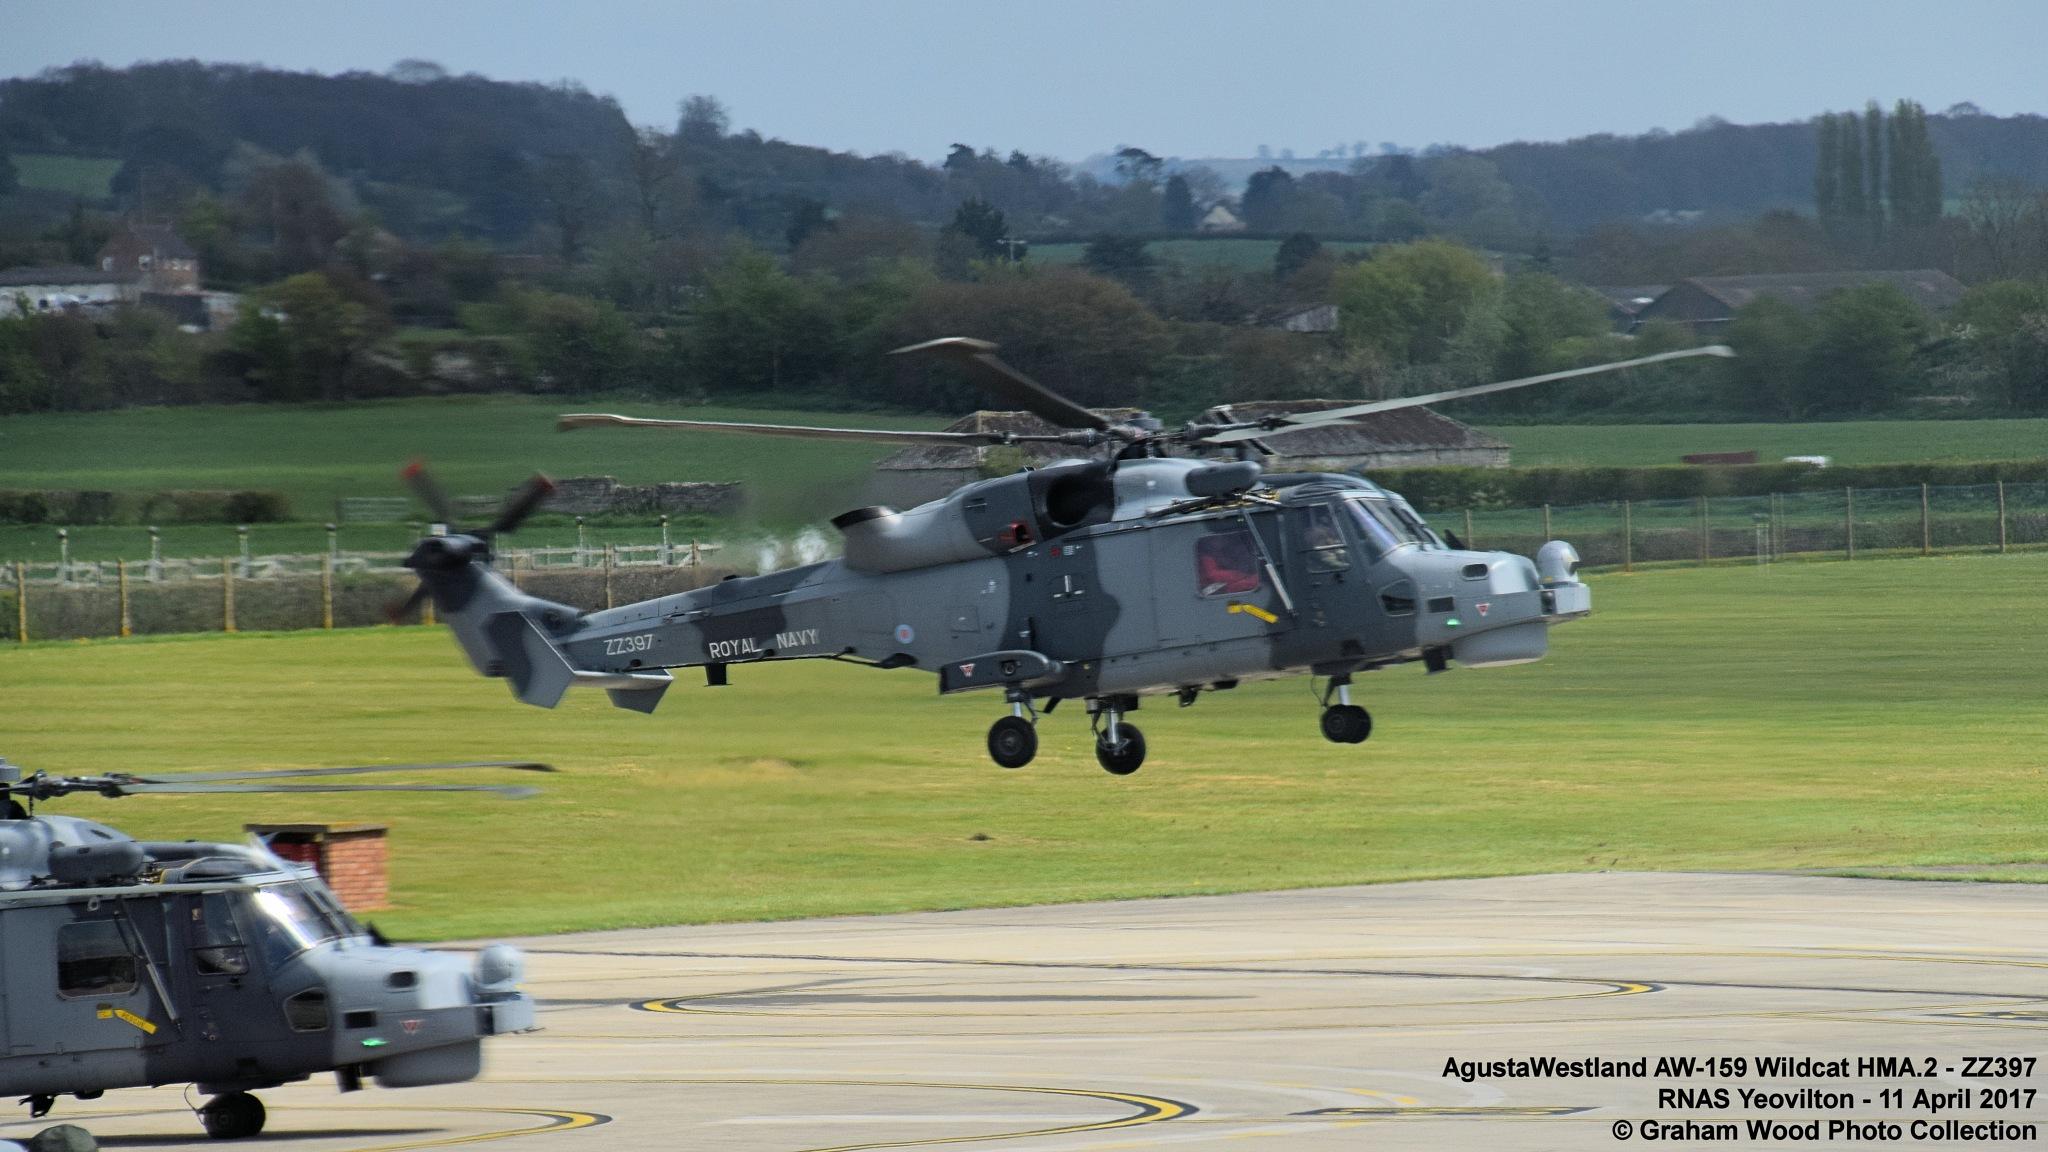 AgustaWestland AW-159 Wildcat HMA.2 - ZZ397 by Graham Wood Photo Collection